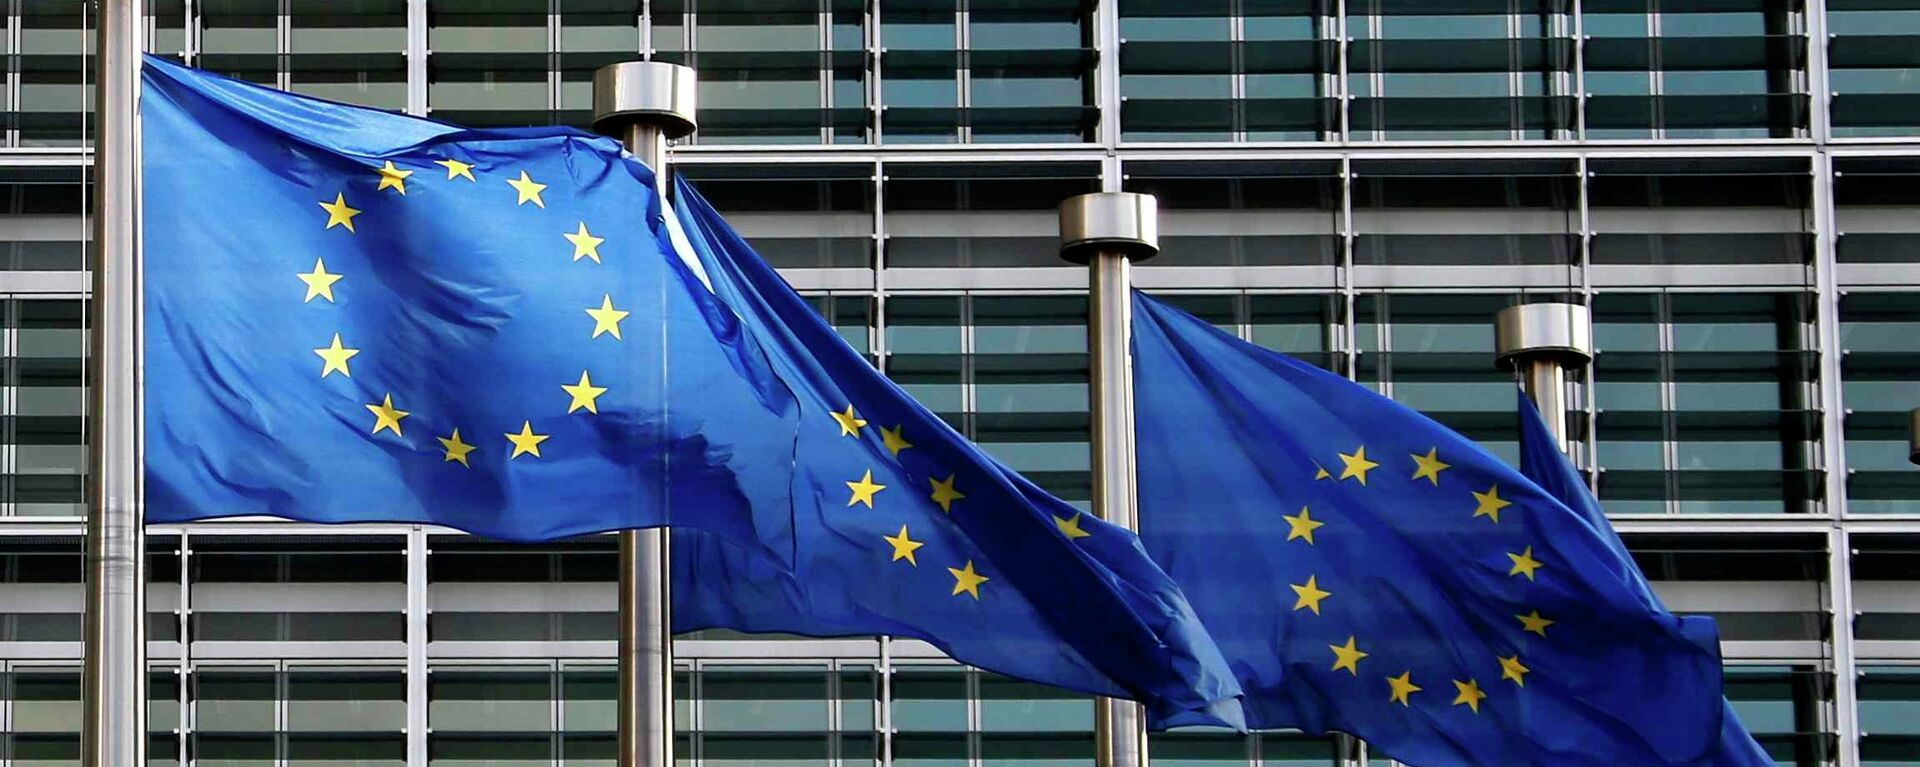 Bandiere Unione Europea di fronte uffici UE a Bruxelles - Sputnik Italia, 1920, 02.06.2021